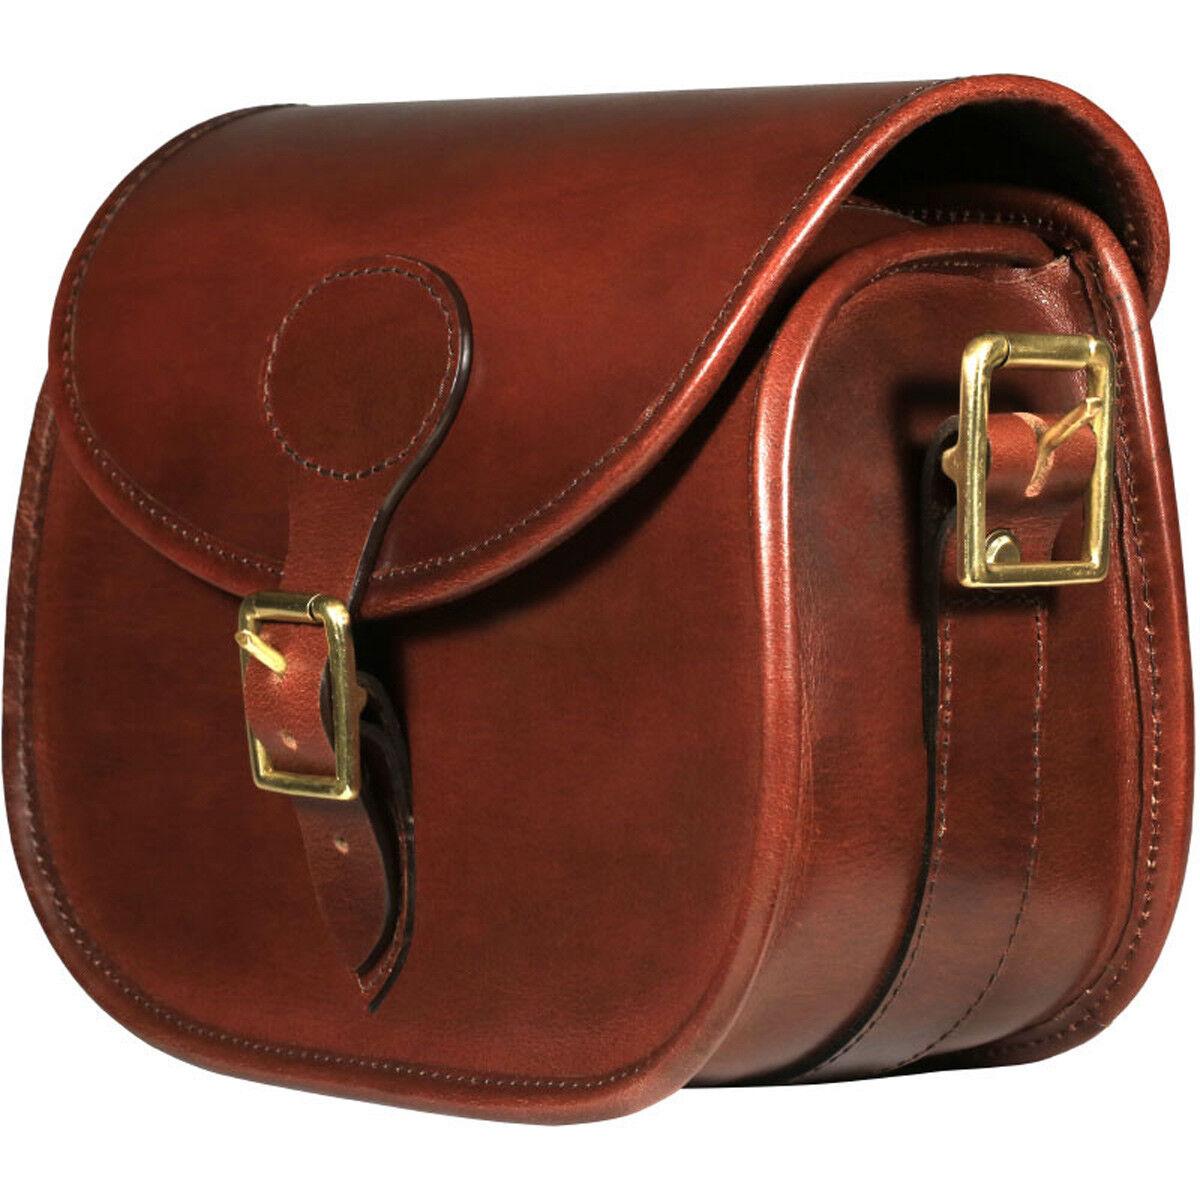 Teales Premier Premium Leather Cartridge Shooting Bag 100 Shells FREE P&P NEW